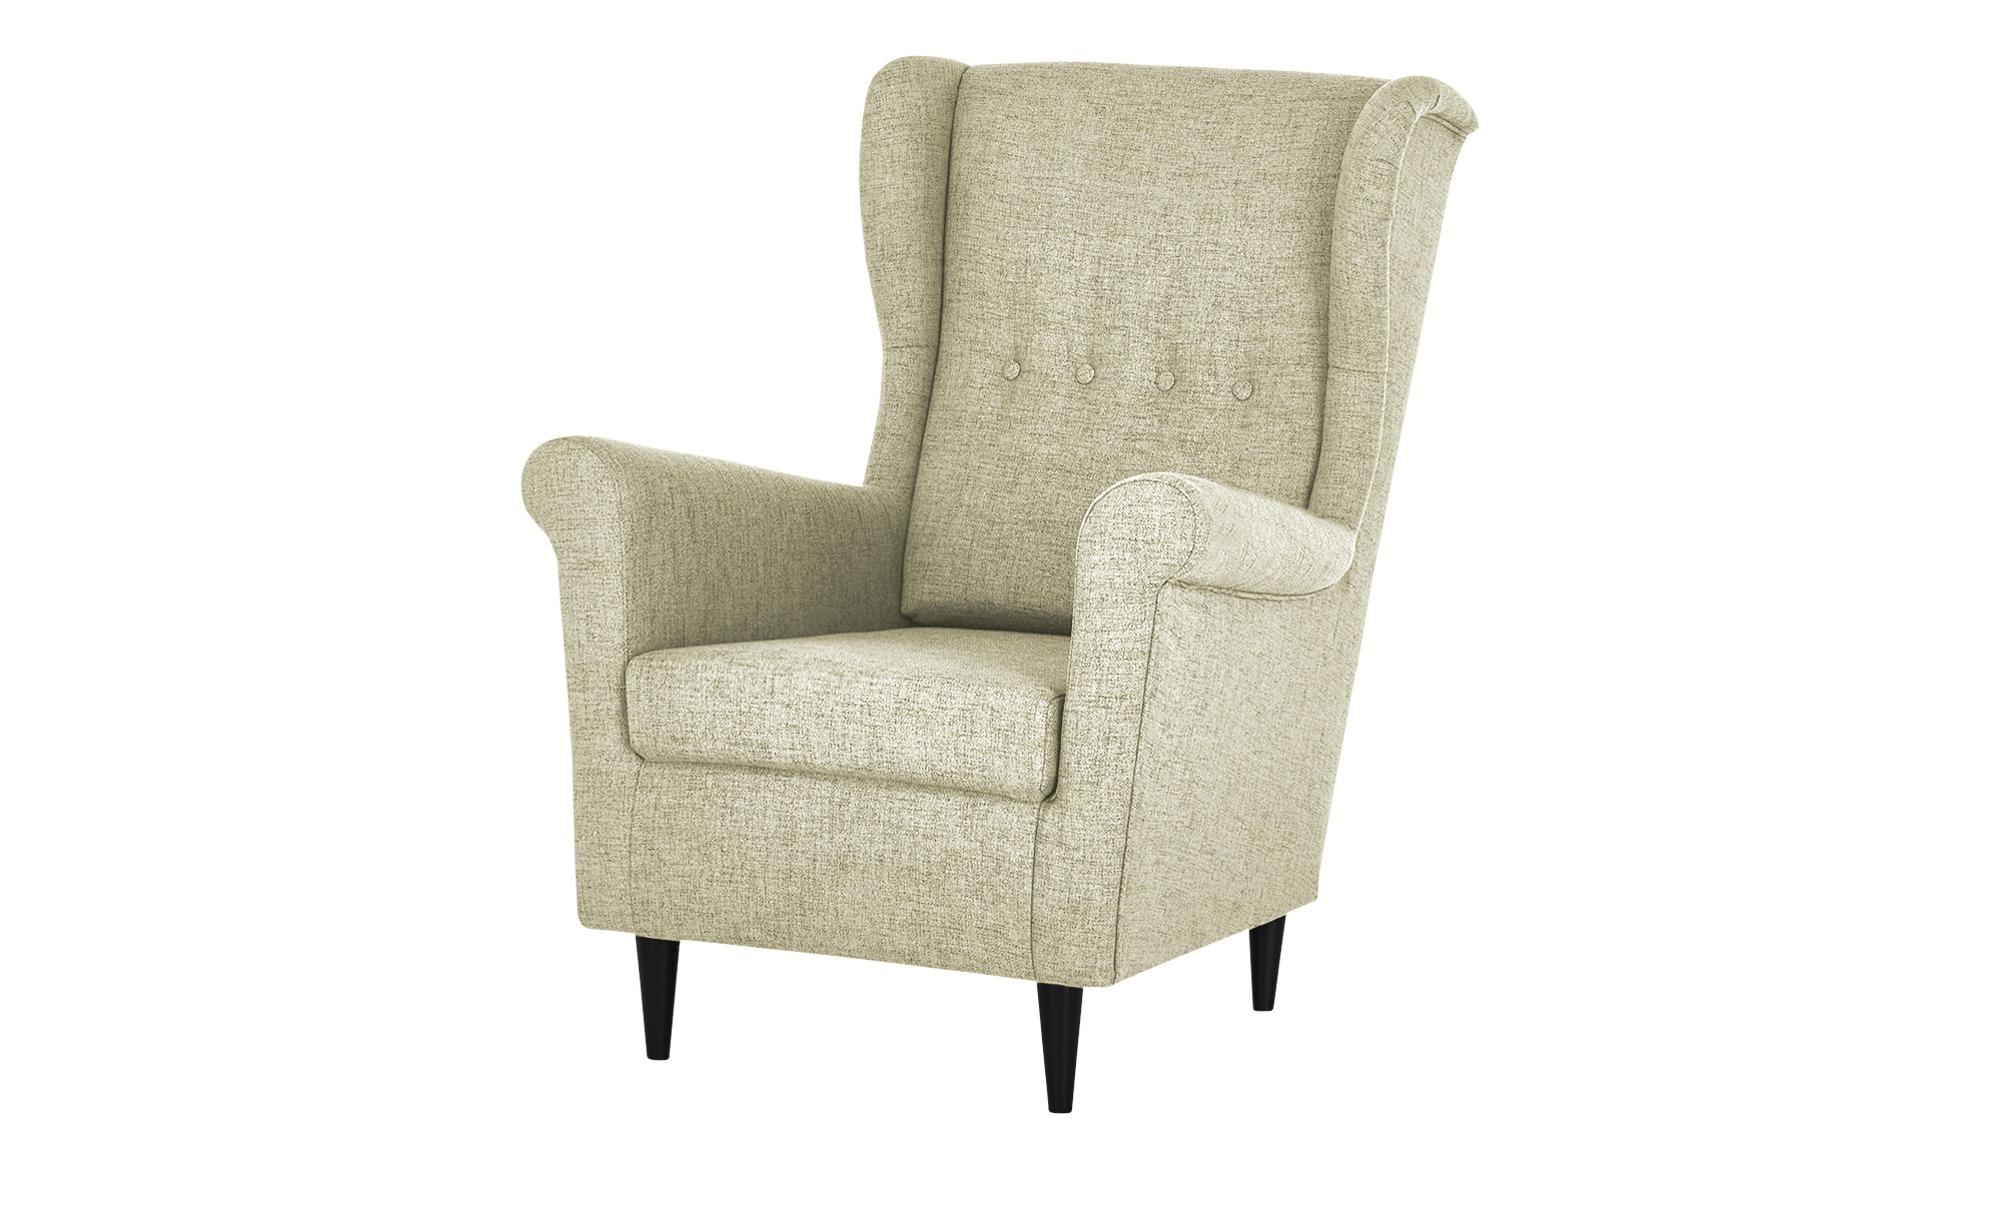 smart Sessel  Hubertine ¦ creme ¦ Maße (cm): B: 82 H: 102 T: 89 Polstermöbel > Sessel > Ohrensessel - Höffner